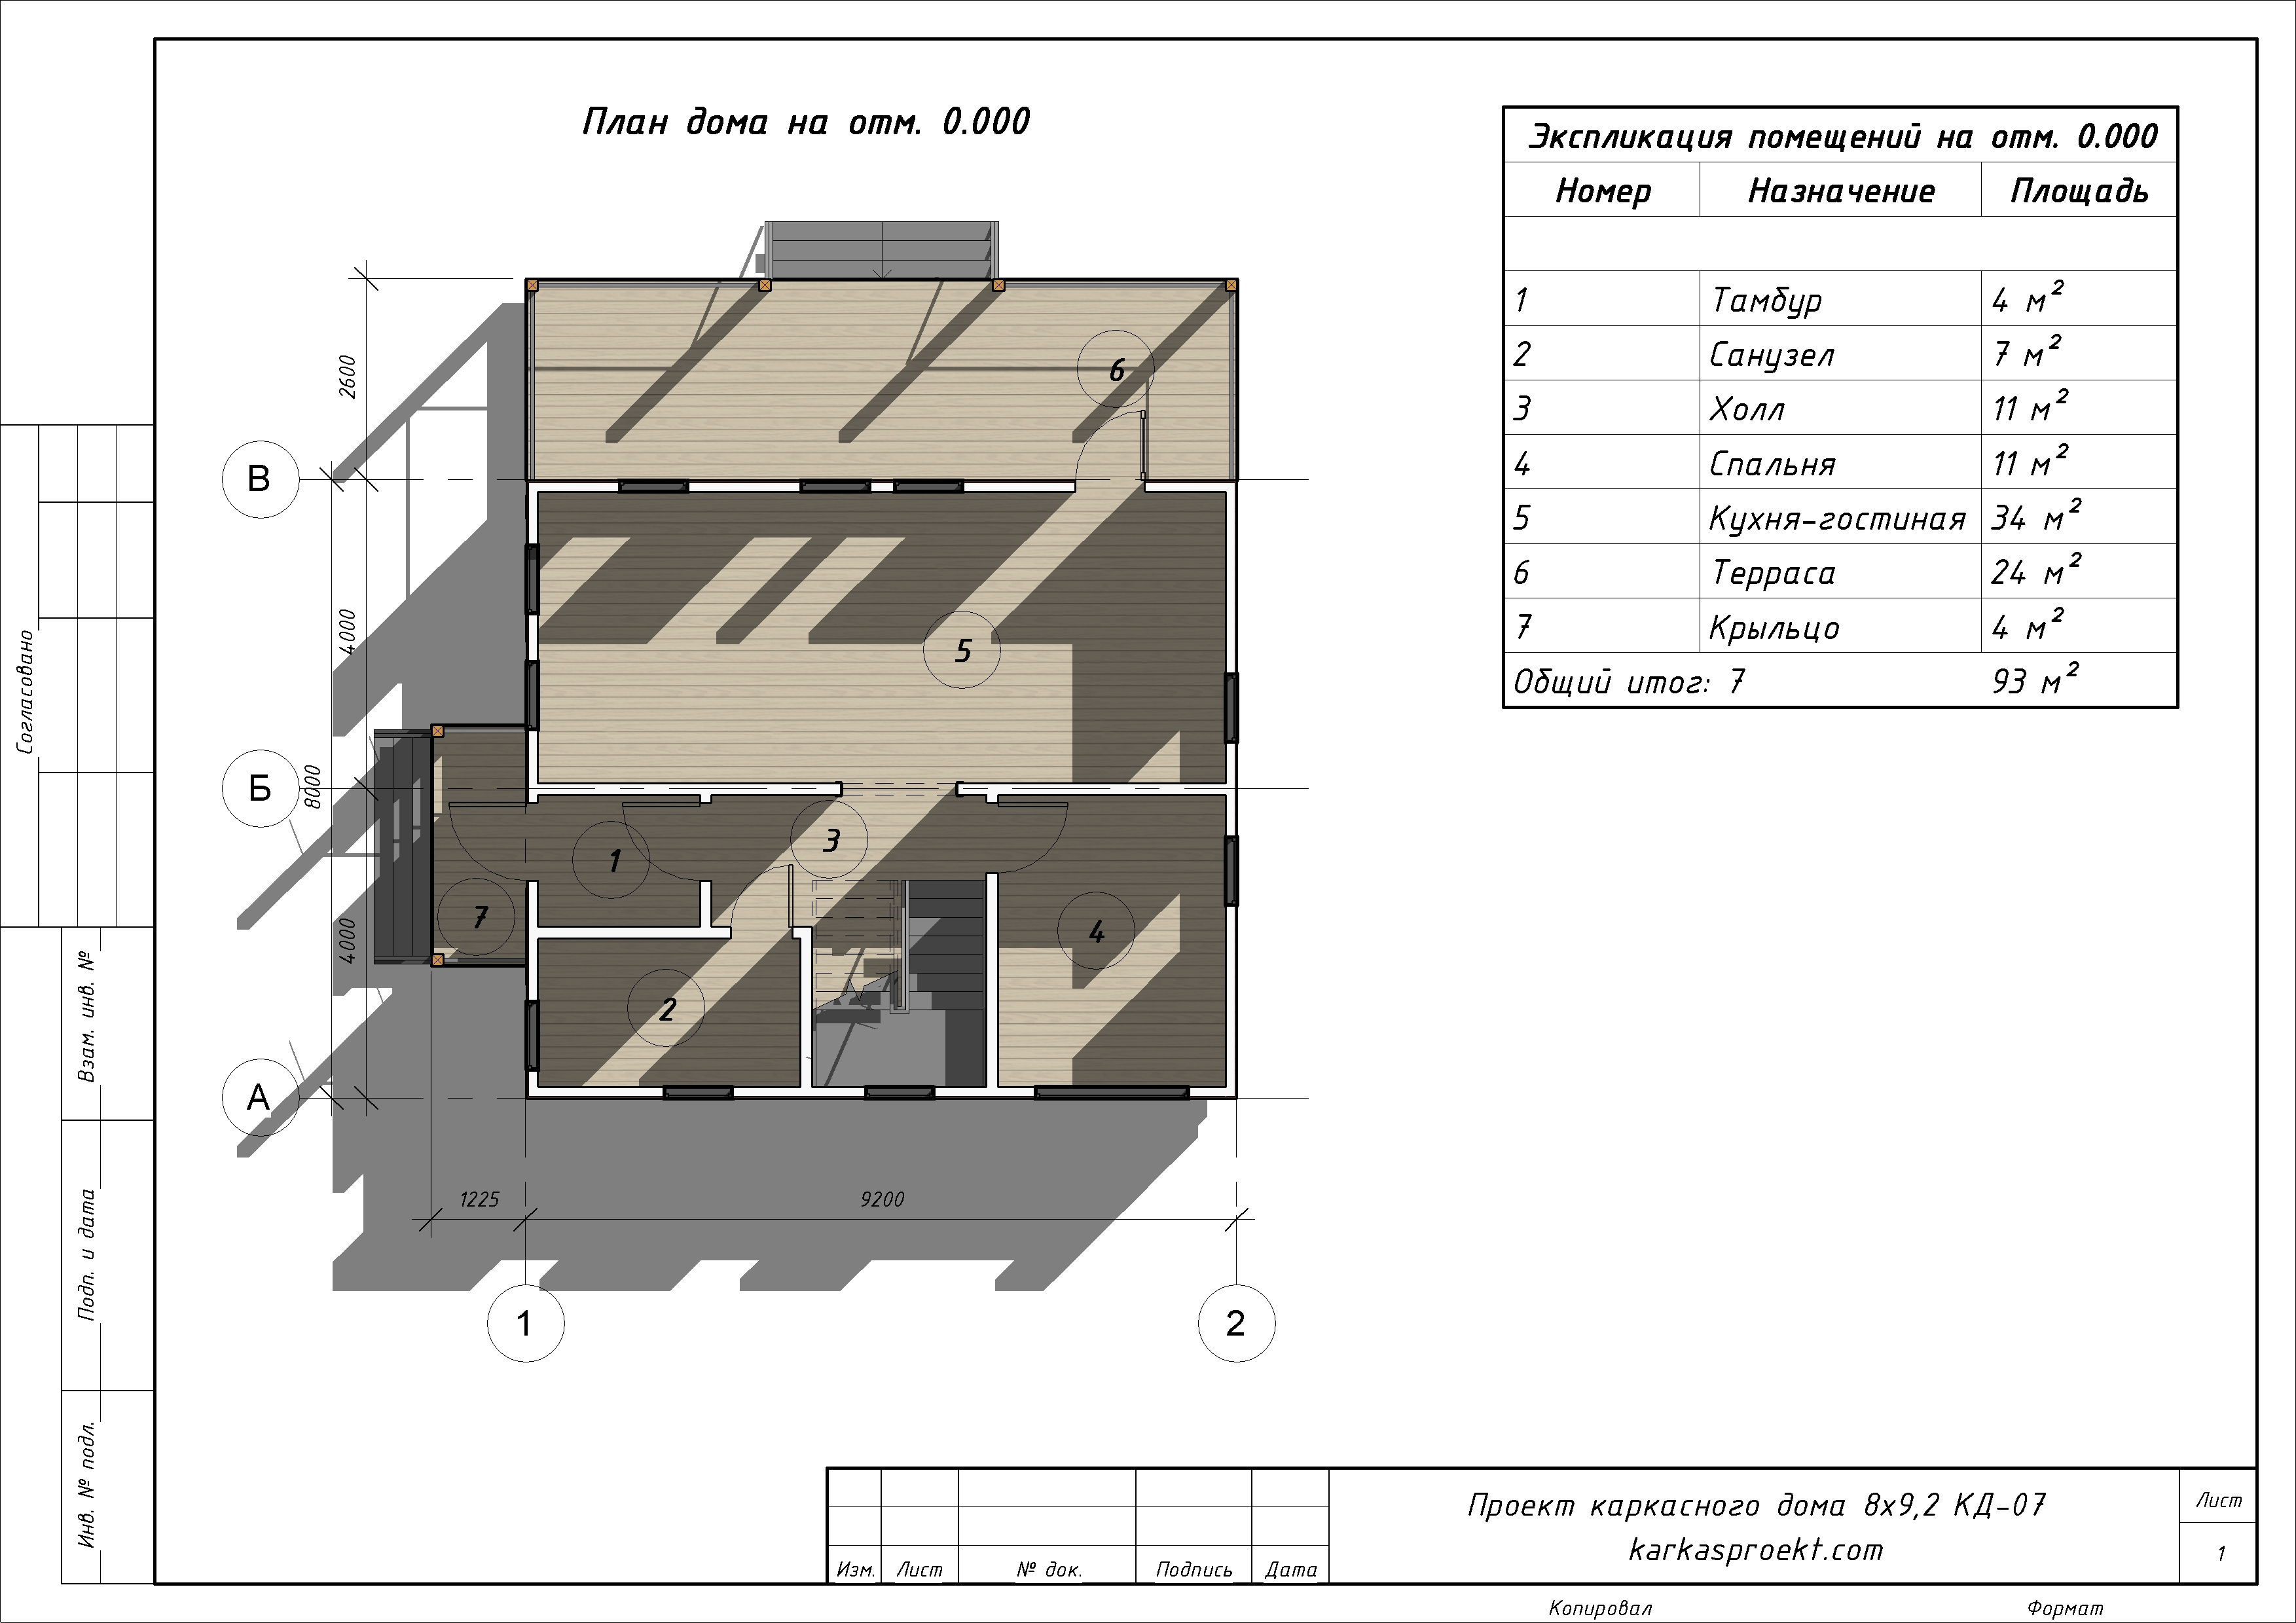 КД-07 - План 1-го этажа